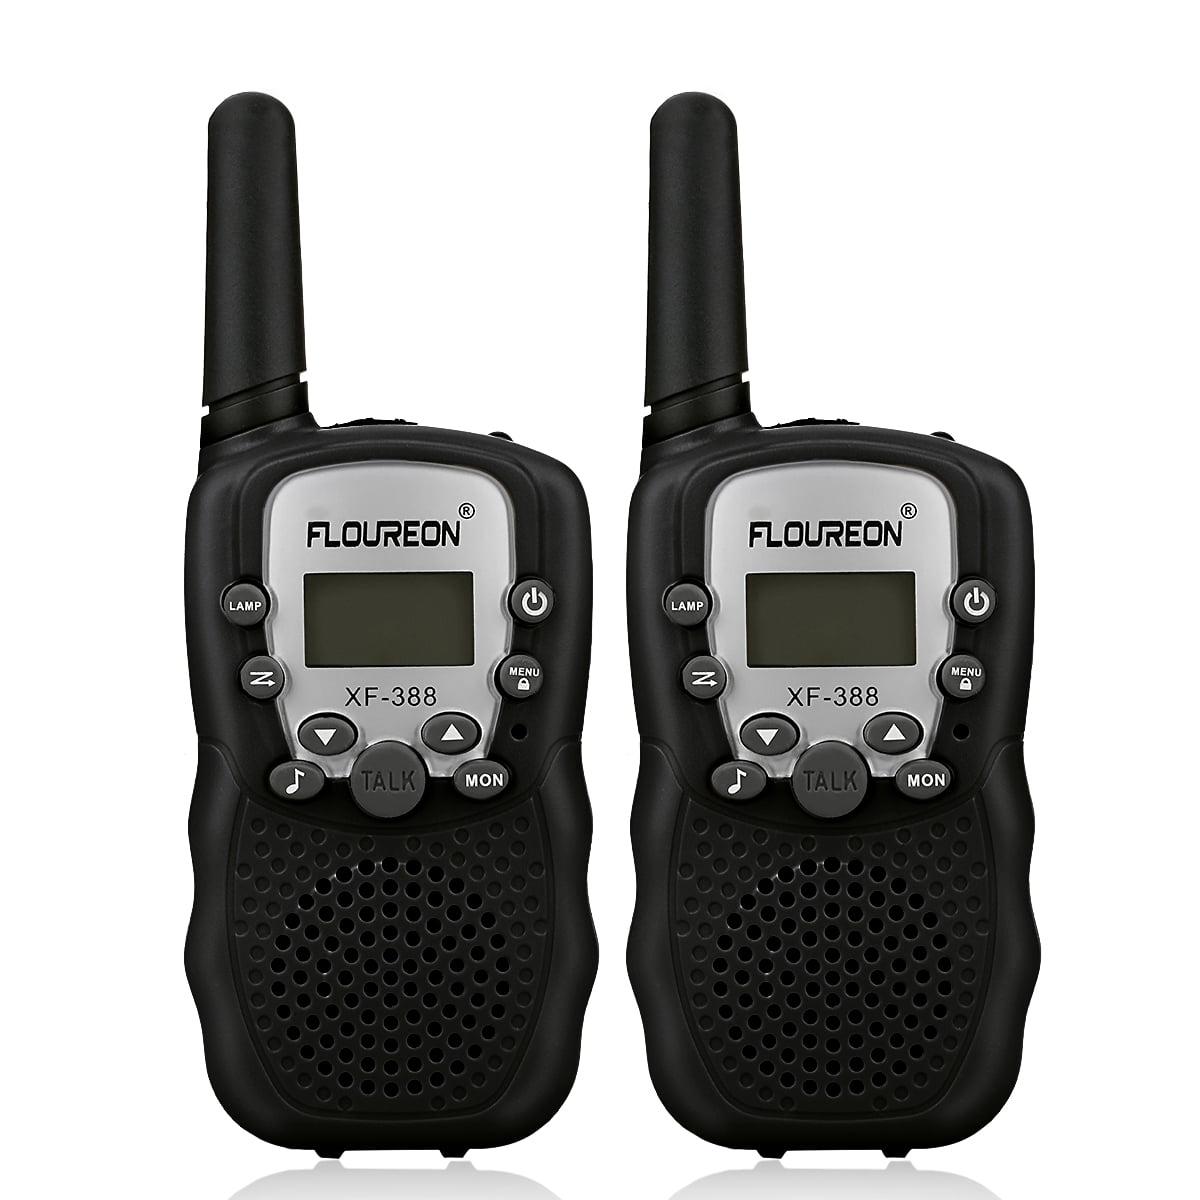 FLOUREON 22 Channel Walkie Talkies UHF462-467MHz 2-Way Radio 3 Km Range Black US by FLOUREON